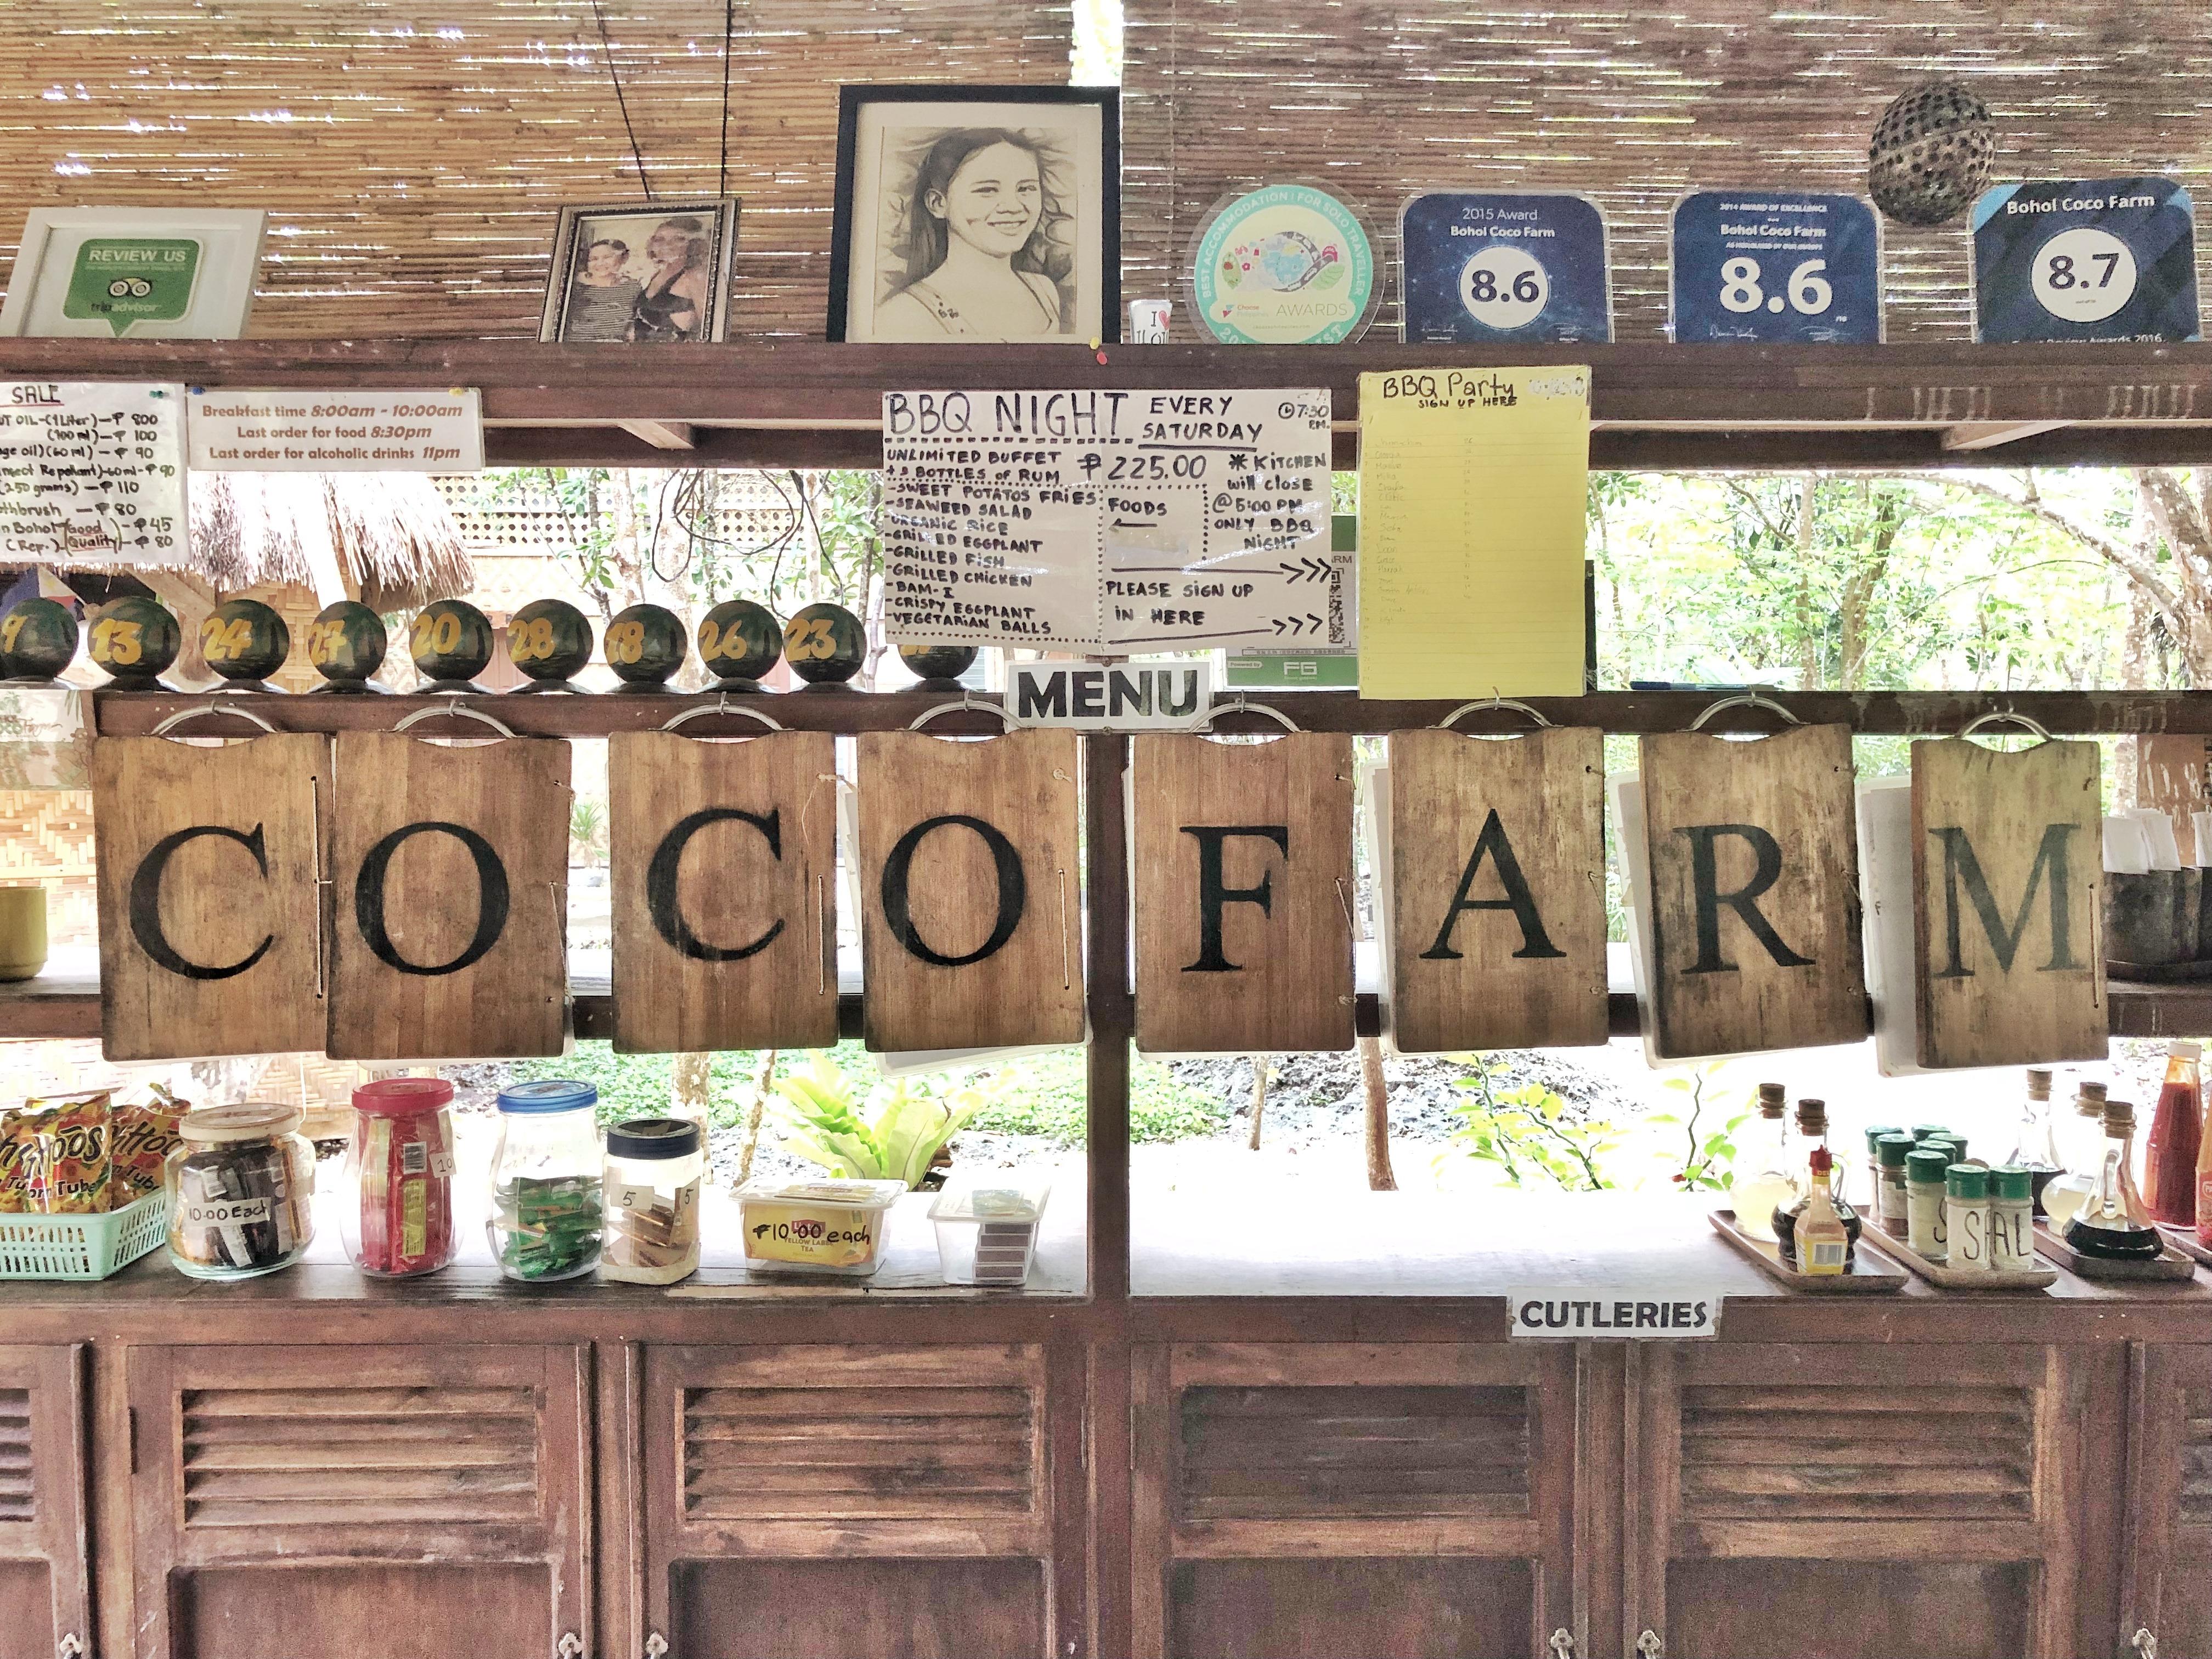 Bohol Coco Farm Restaurant